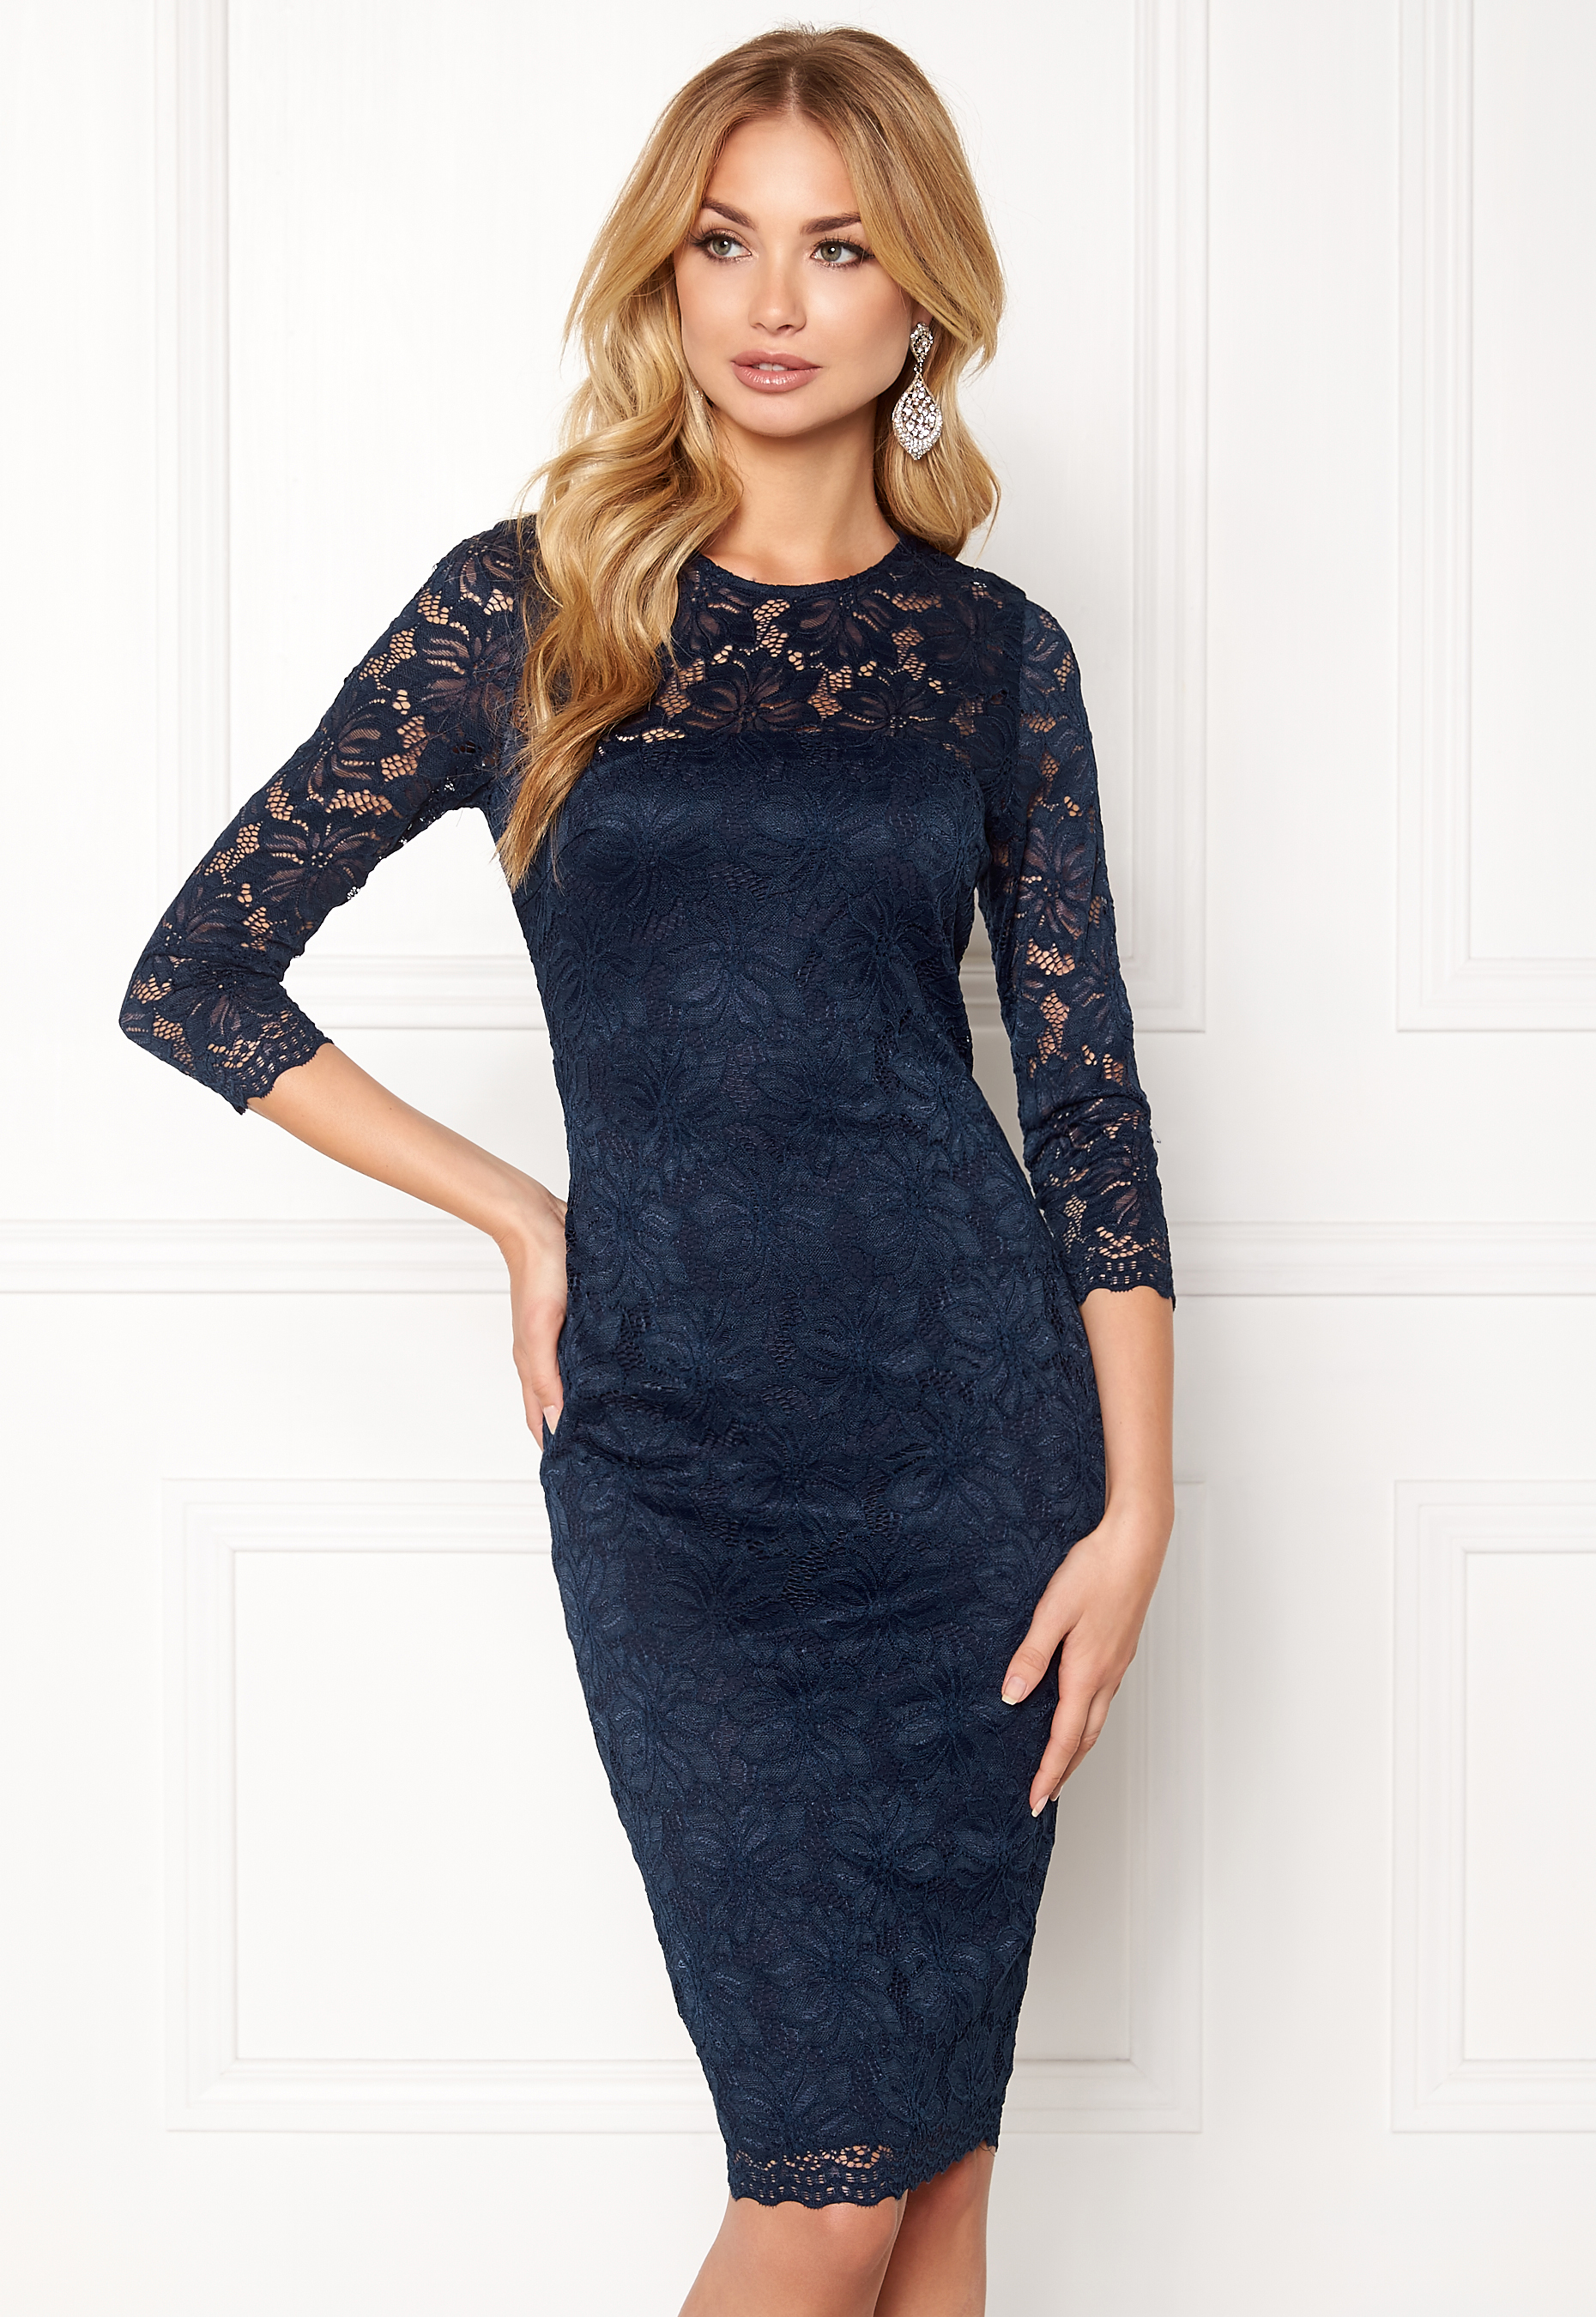 Shapes ax paris lace bodycon midi dress